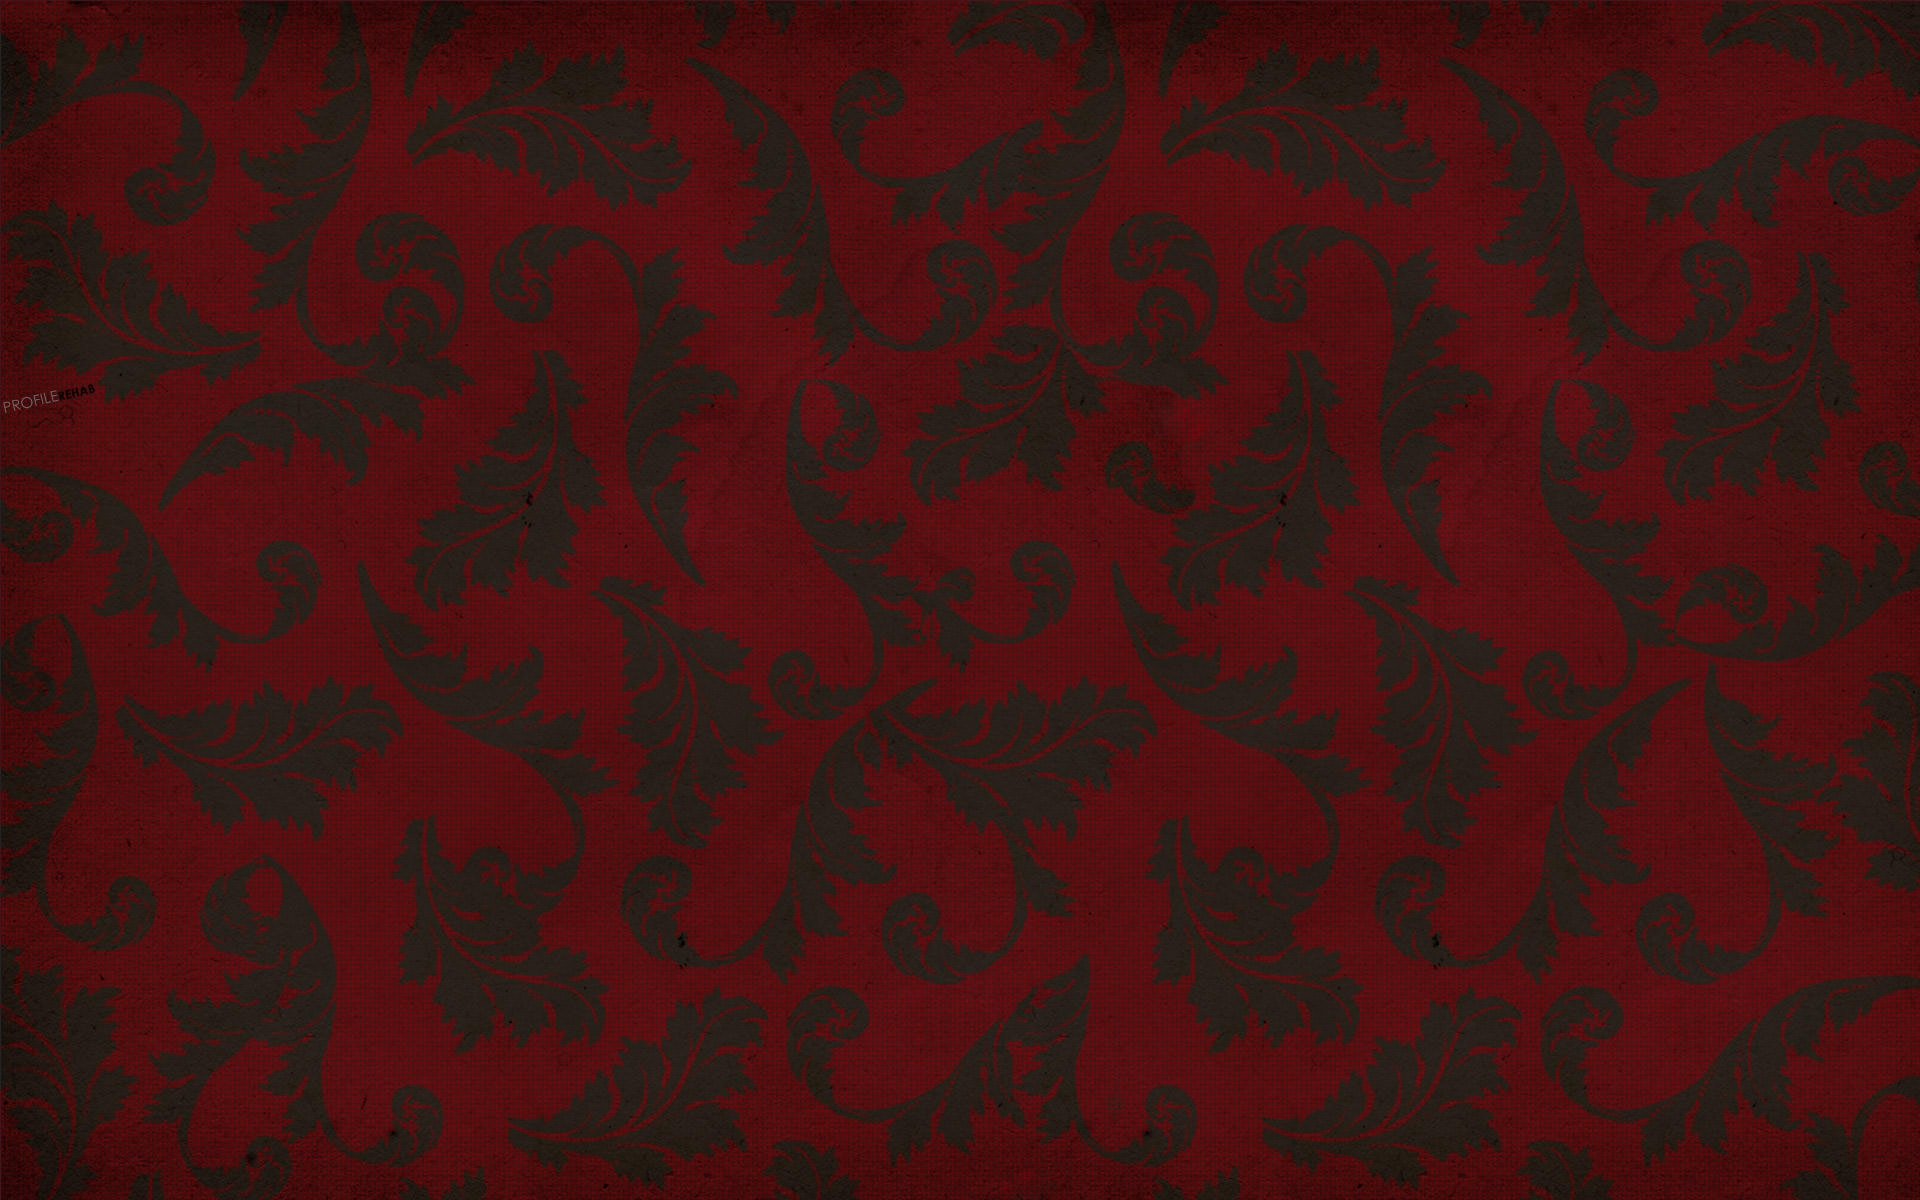 10 vintage red backgrounds hq backgrounds freecreatives for Dark pattern background